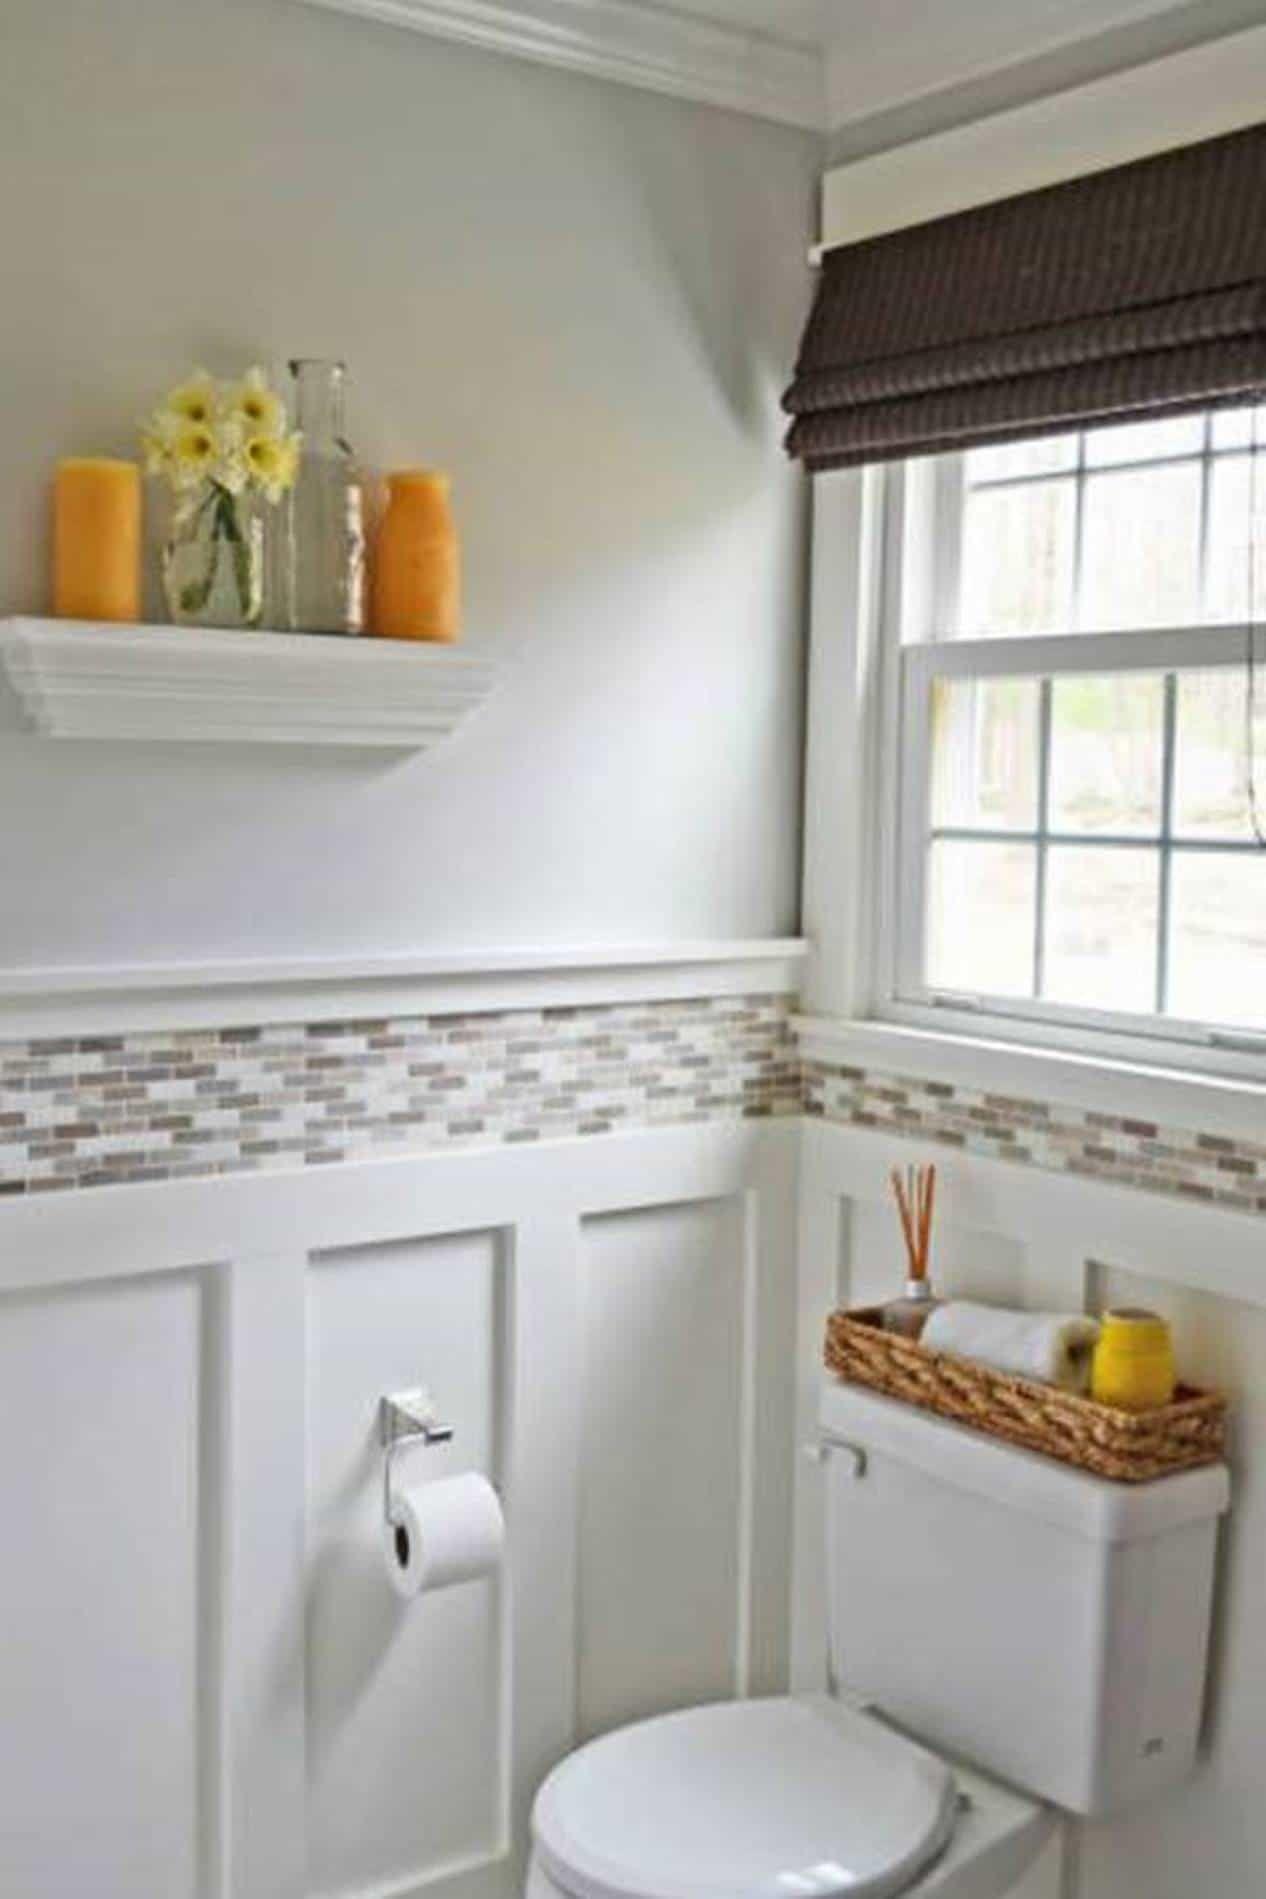 Wainscoting Interior Bathroom Design With Top Tiles : Bathroom ...